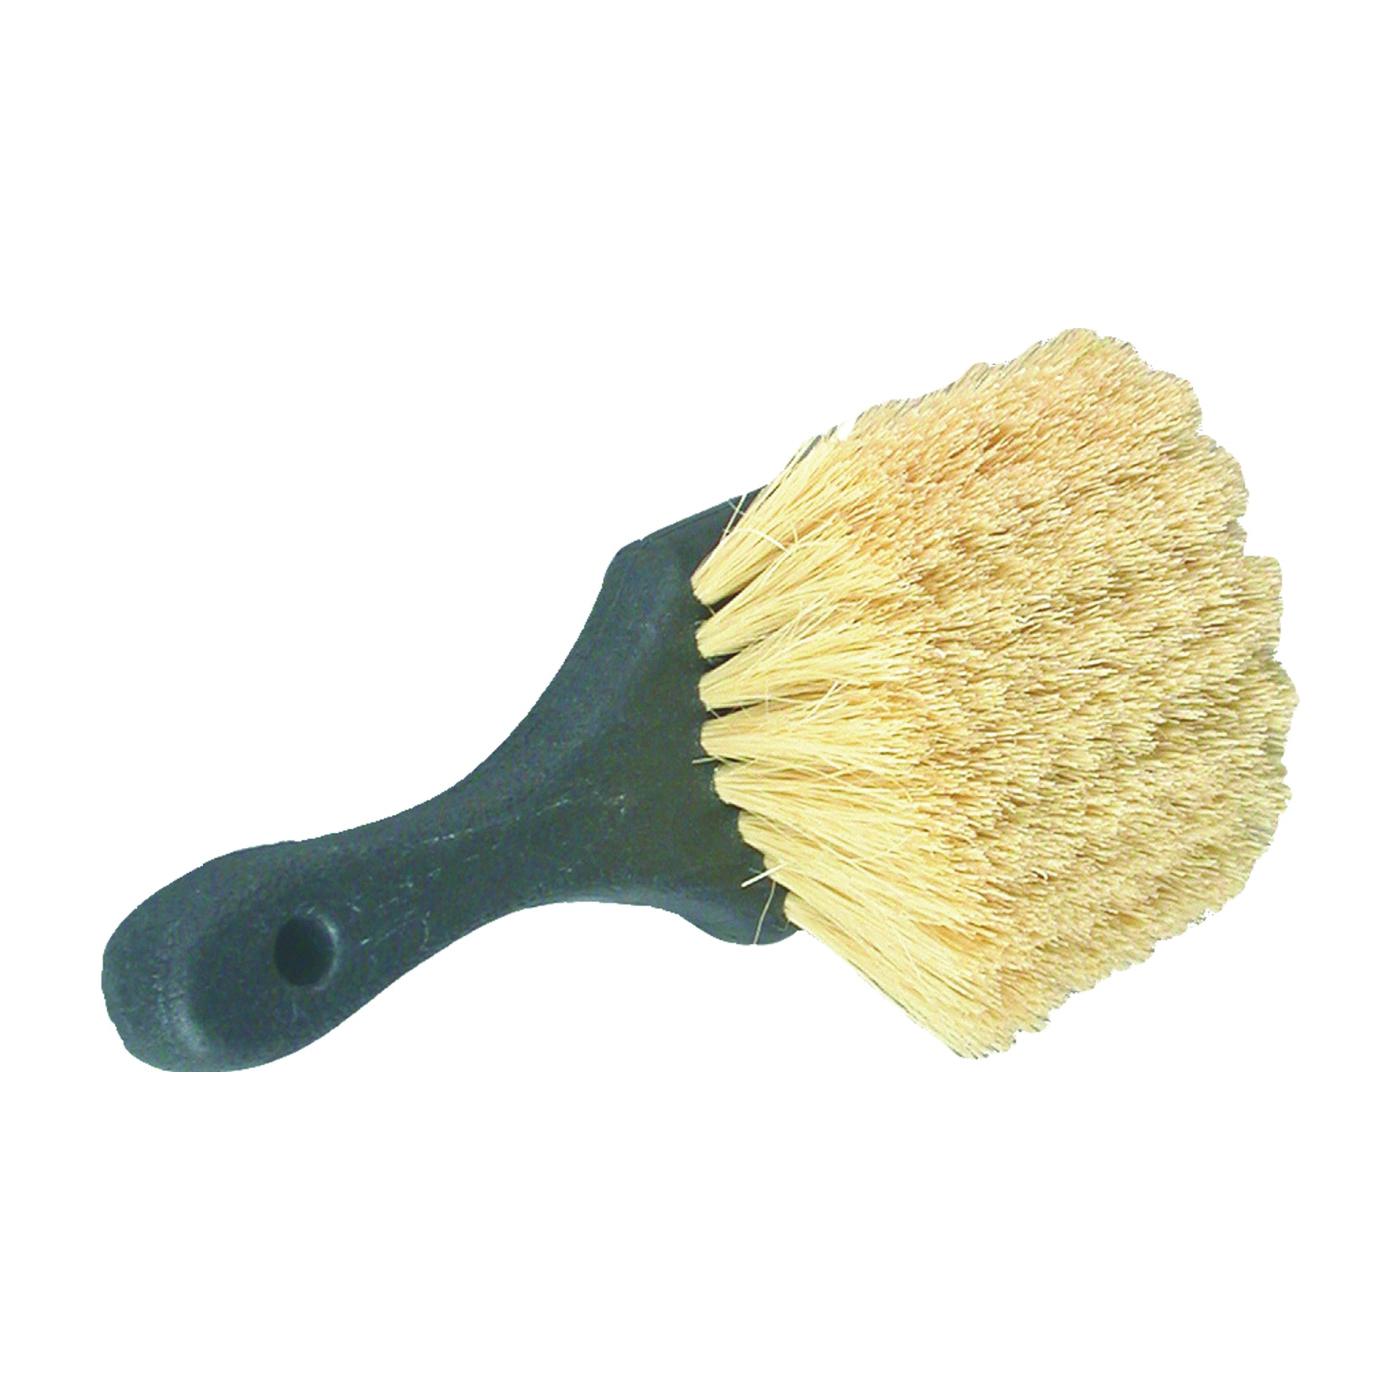 Picture of BIRDWELL 472-24 Utility Brush, 2 in L Trim